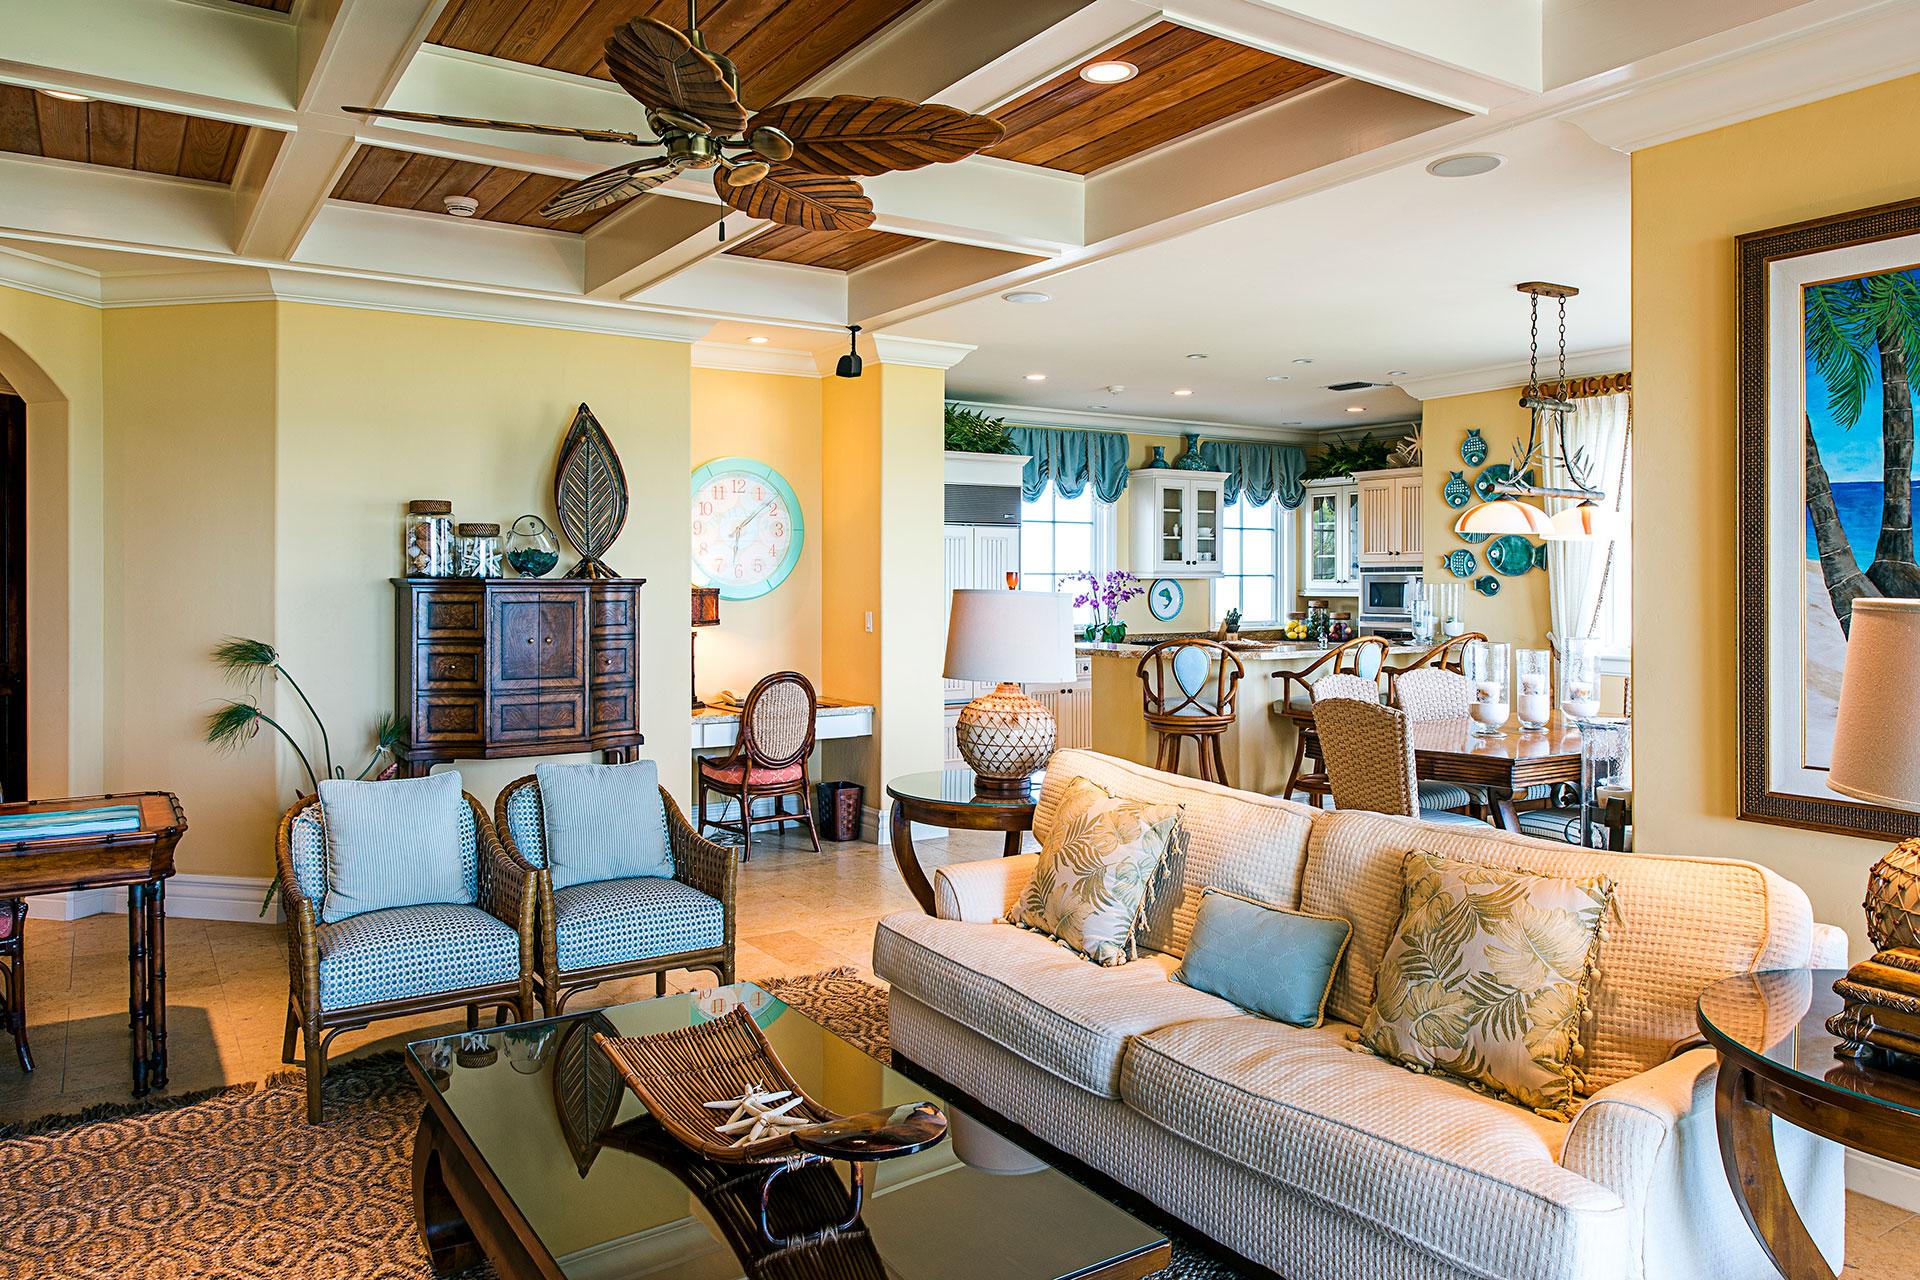 Villa at Grand Isle Resort and Spa on Great Exuma in the Bahamas; Courtesy of Grand Isle Resort and Spa